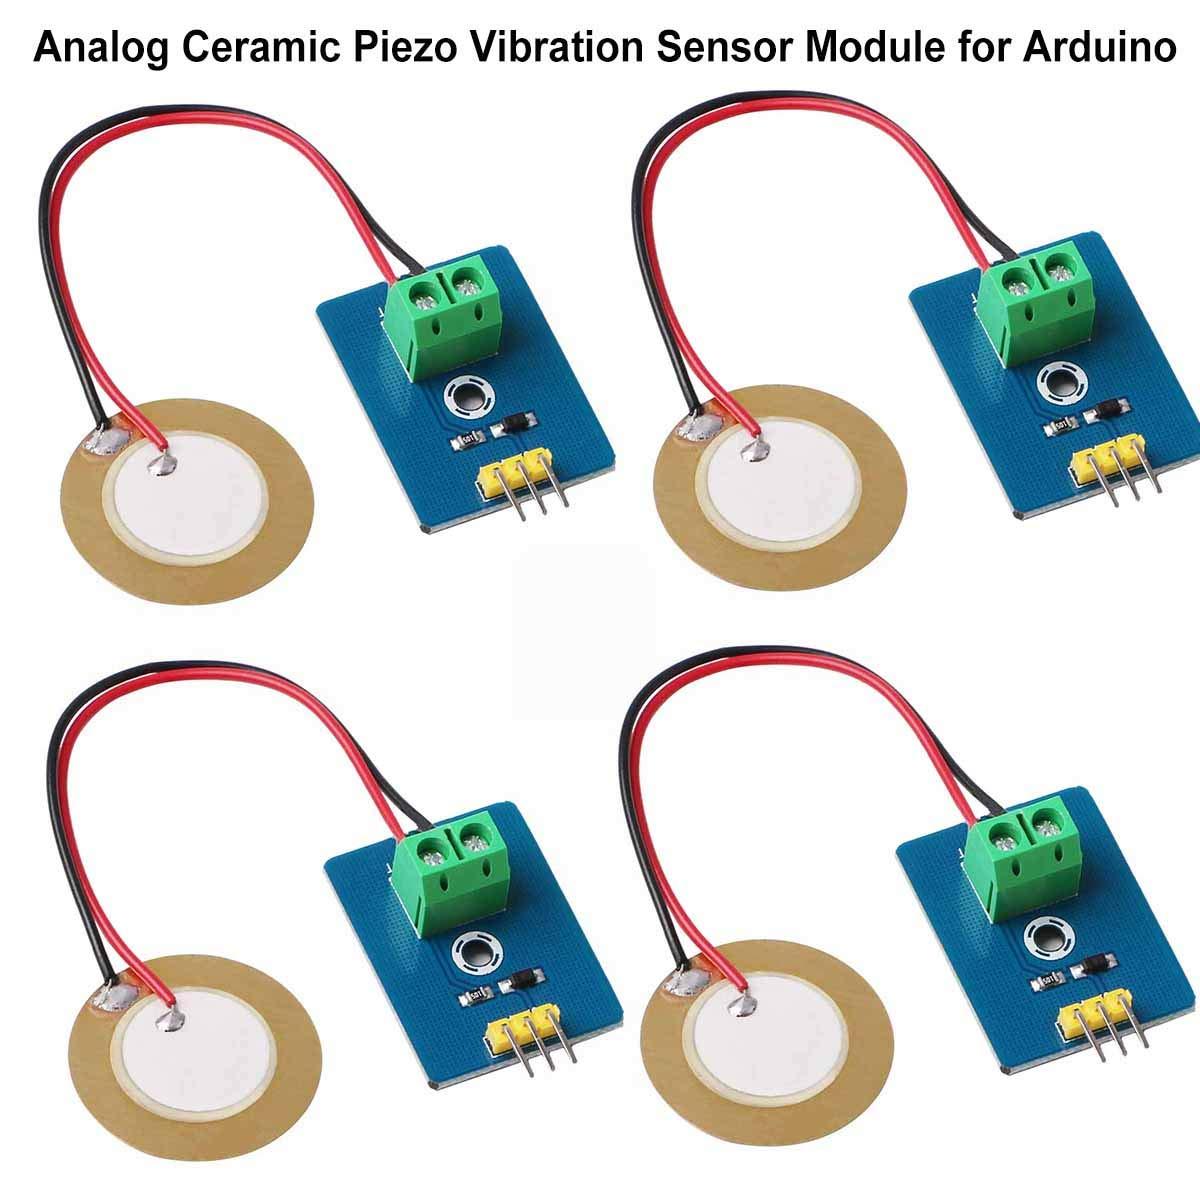 Innovateking-EU 4 st/ücke Analog Piezoelectric Ceramic Vibration Sensor analog Keramik piezo vibrationssensor modul 3,3 v 5 v f/ür arduino DIY kit